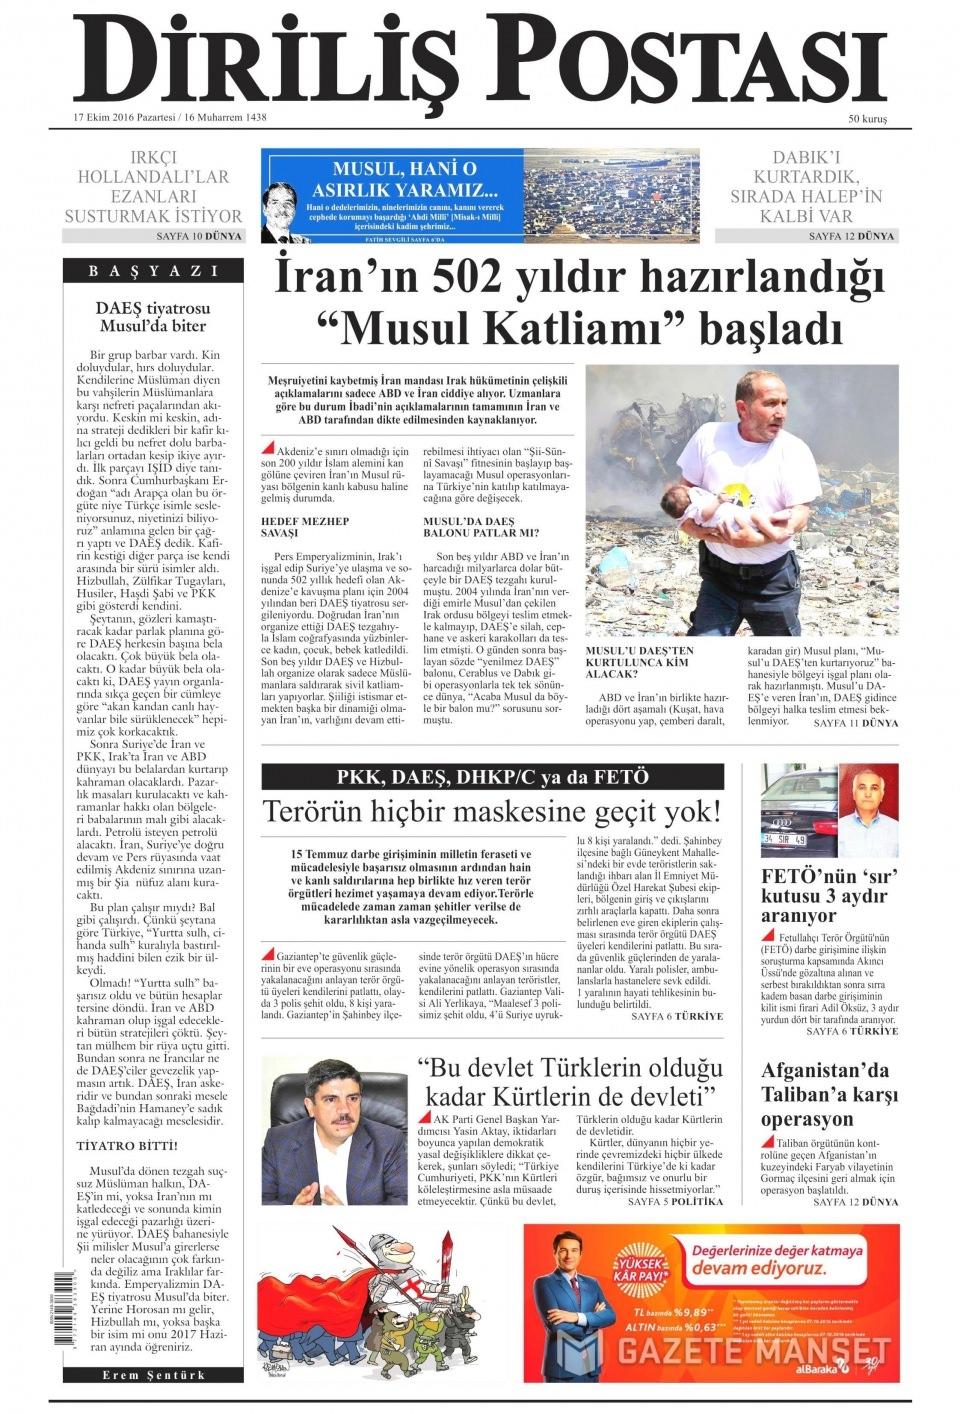 17 Ekim Pazartesi gazete manşetleri 22